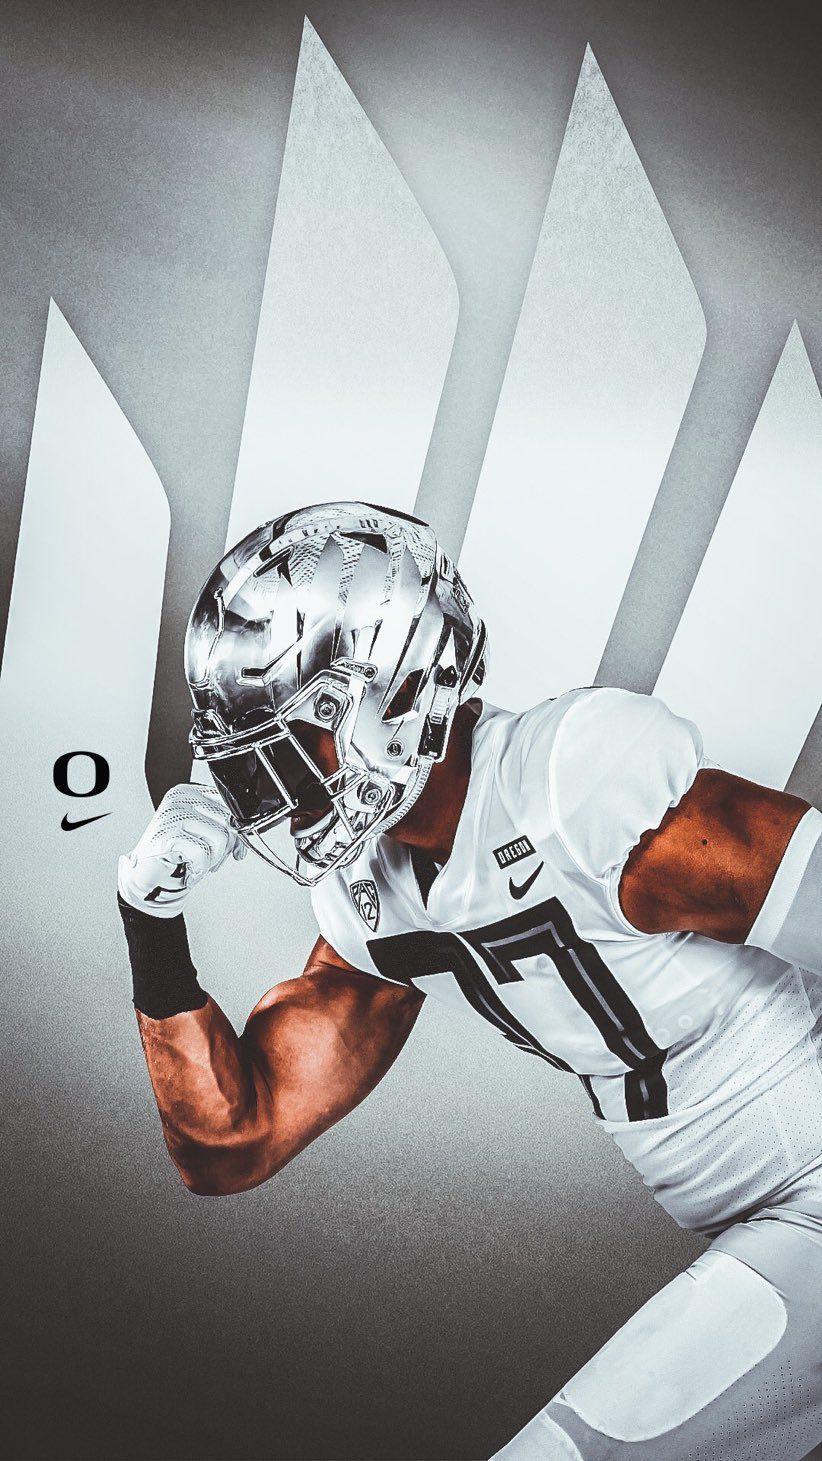 Oregon Wallpaper Sports Design Inspiration Sports Design Oregon Football